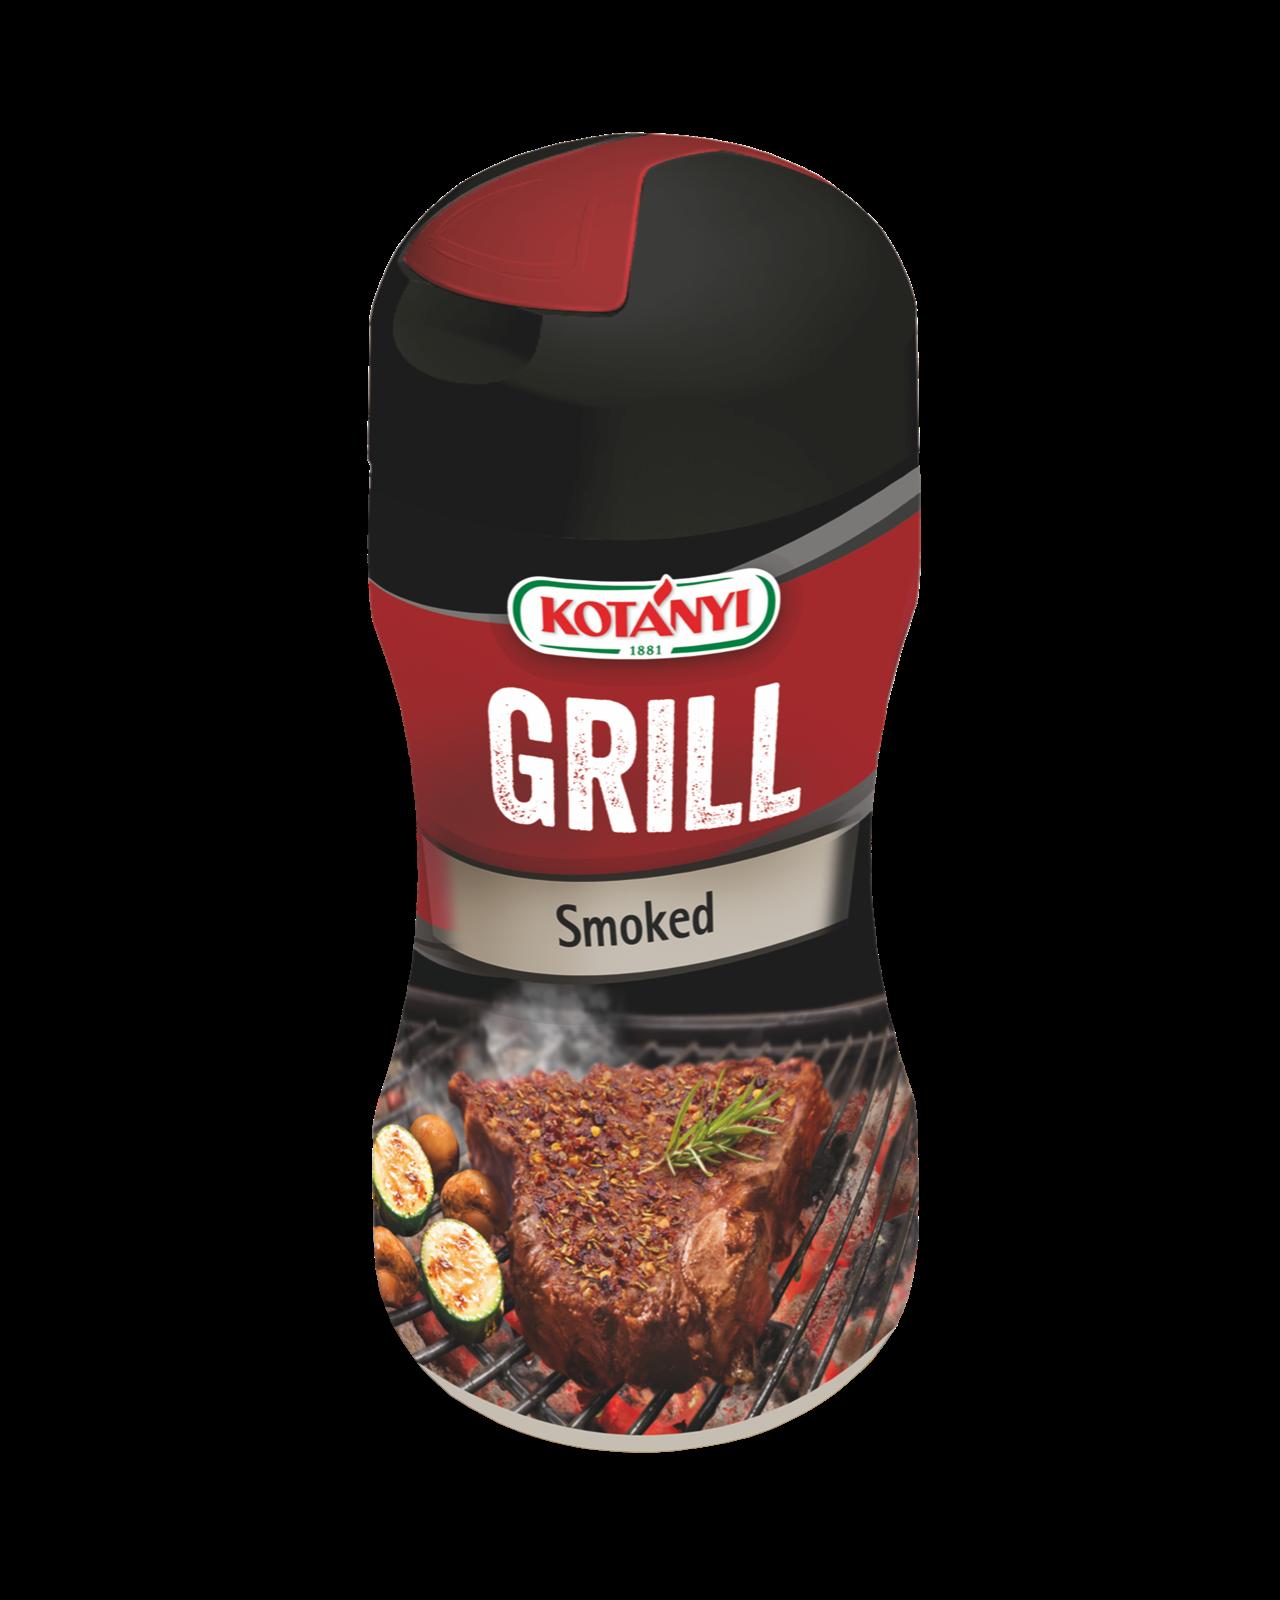 0684086 Kotanyi Grill Smoked Shaker Can